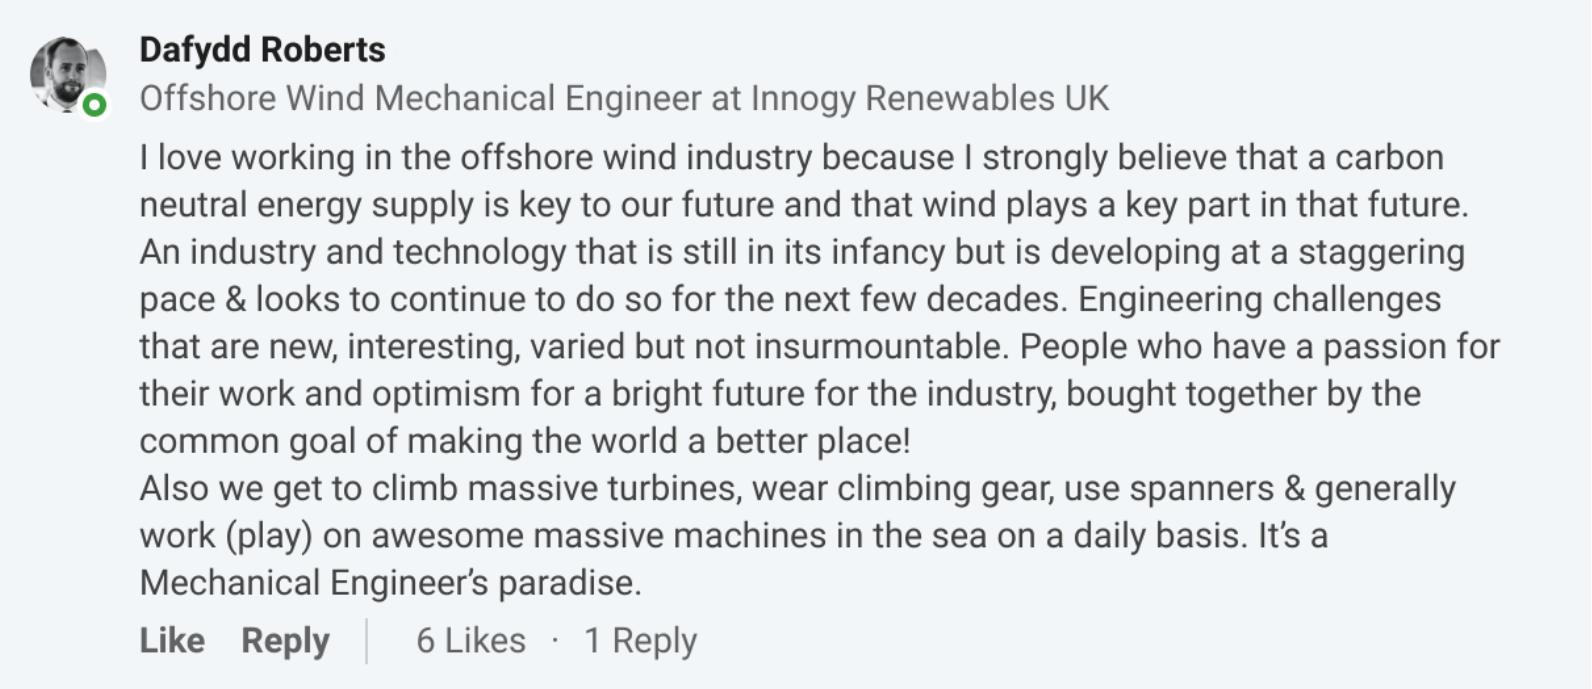 Dafydd Roberts from Innogy Renewables UK